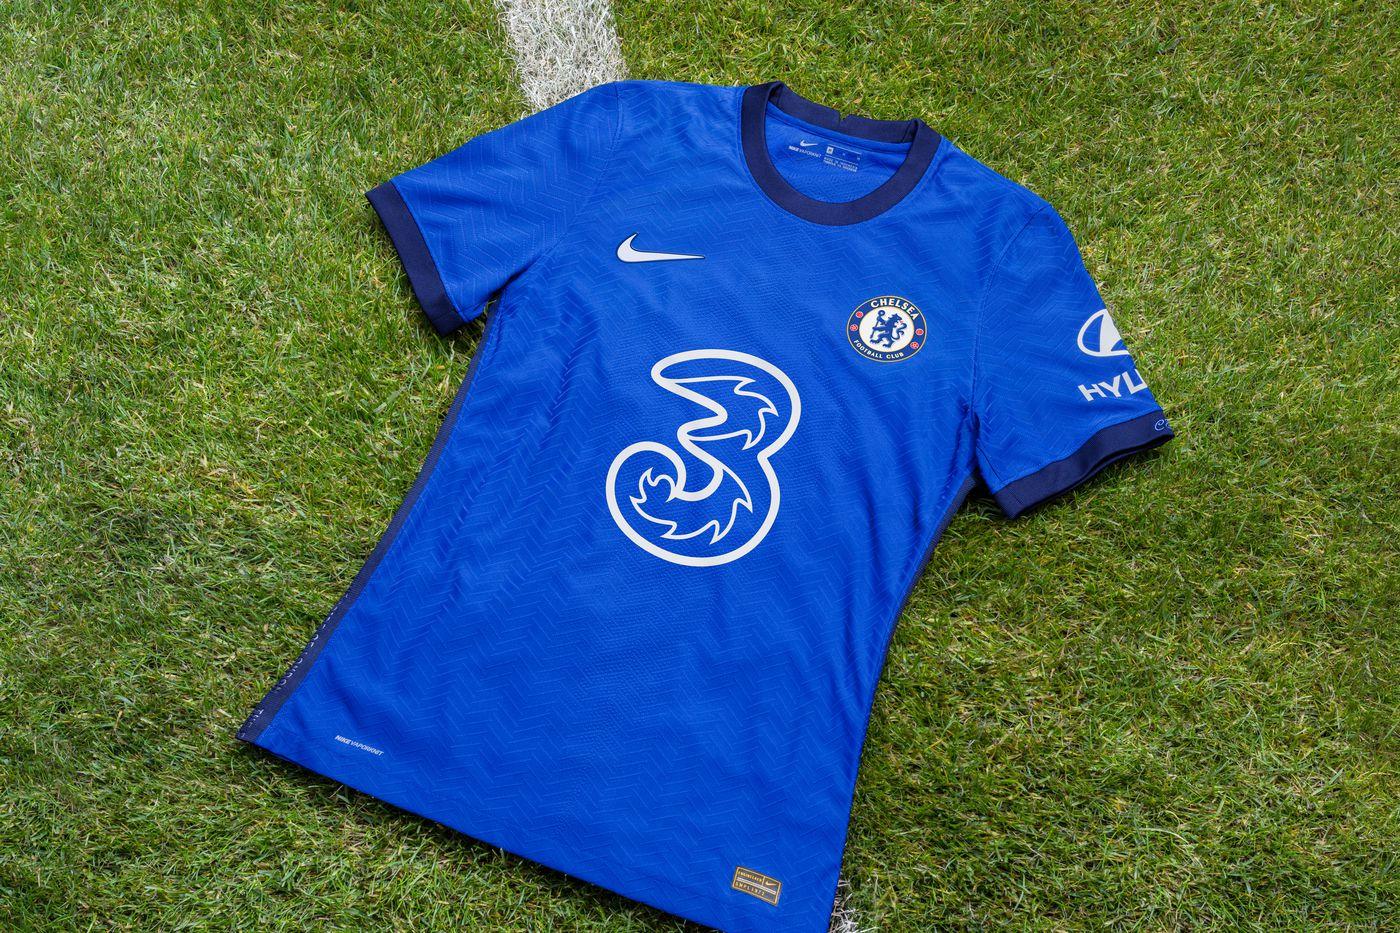 Nike Three Uk Unveil New Chelsea Home Kit For 2020 21 Season We Ain T Got No History